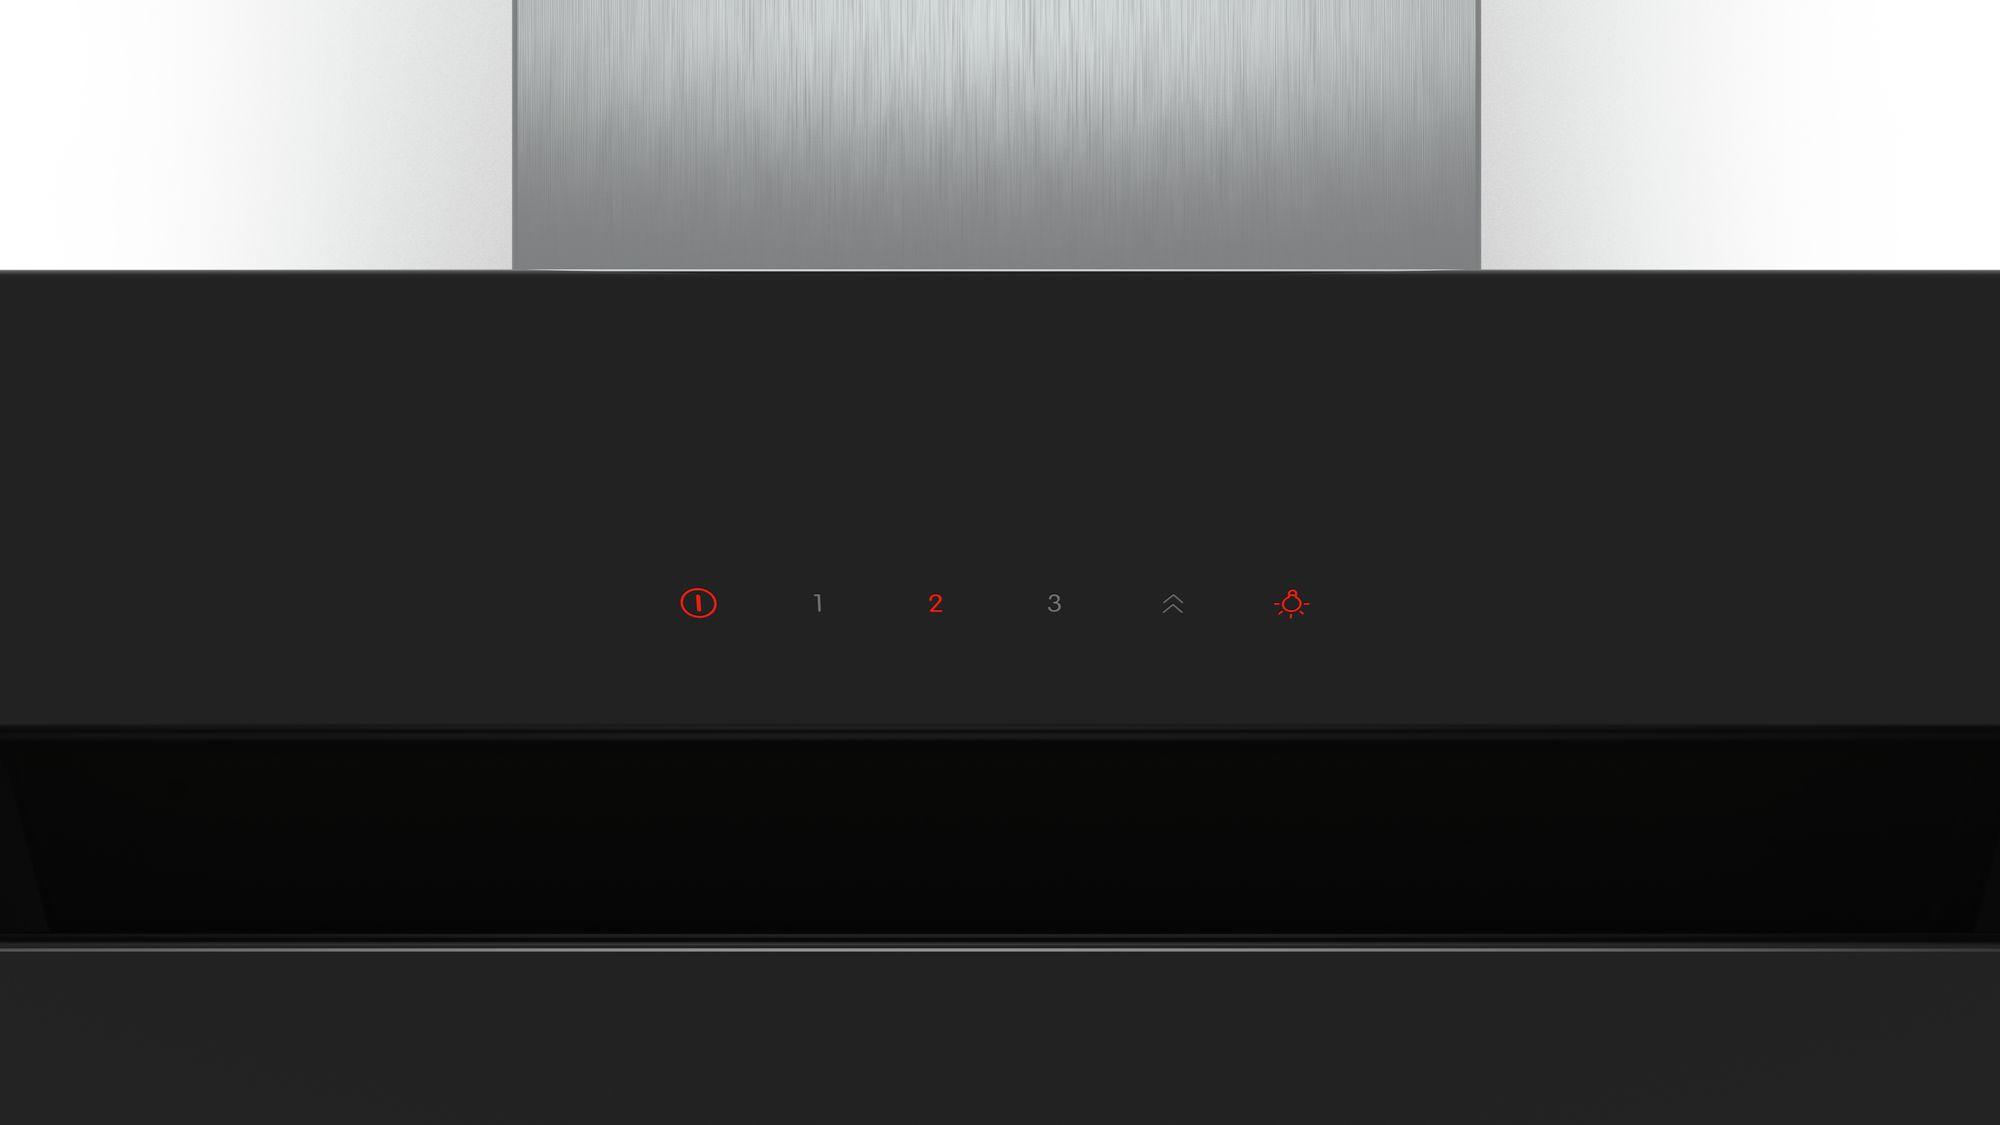 Serie | 6 Zidni aspirator, 90 cm Nagnut zaslon